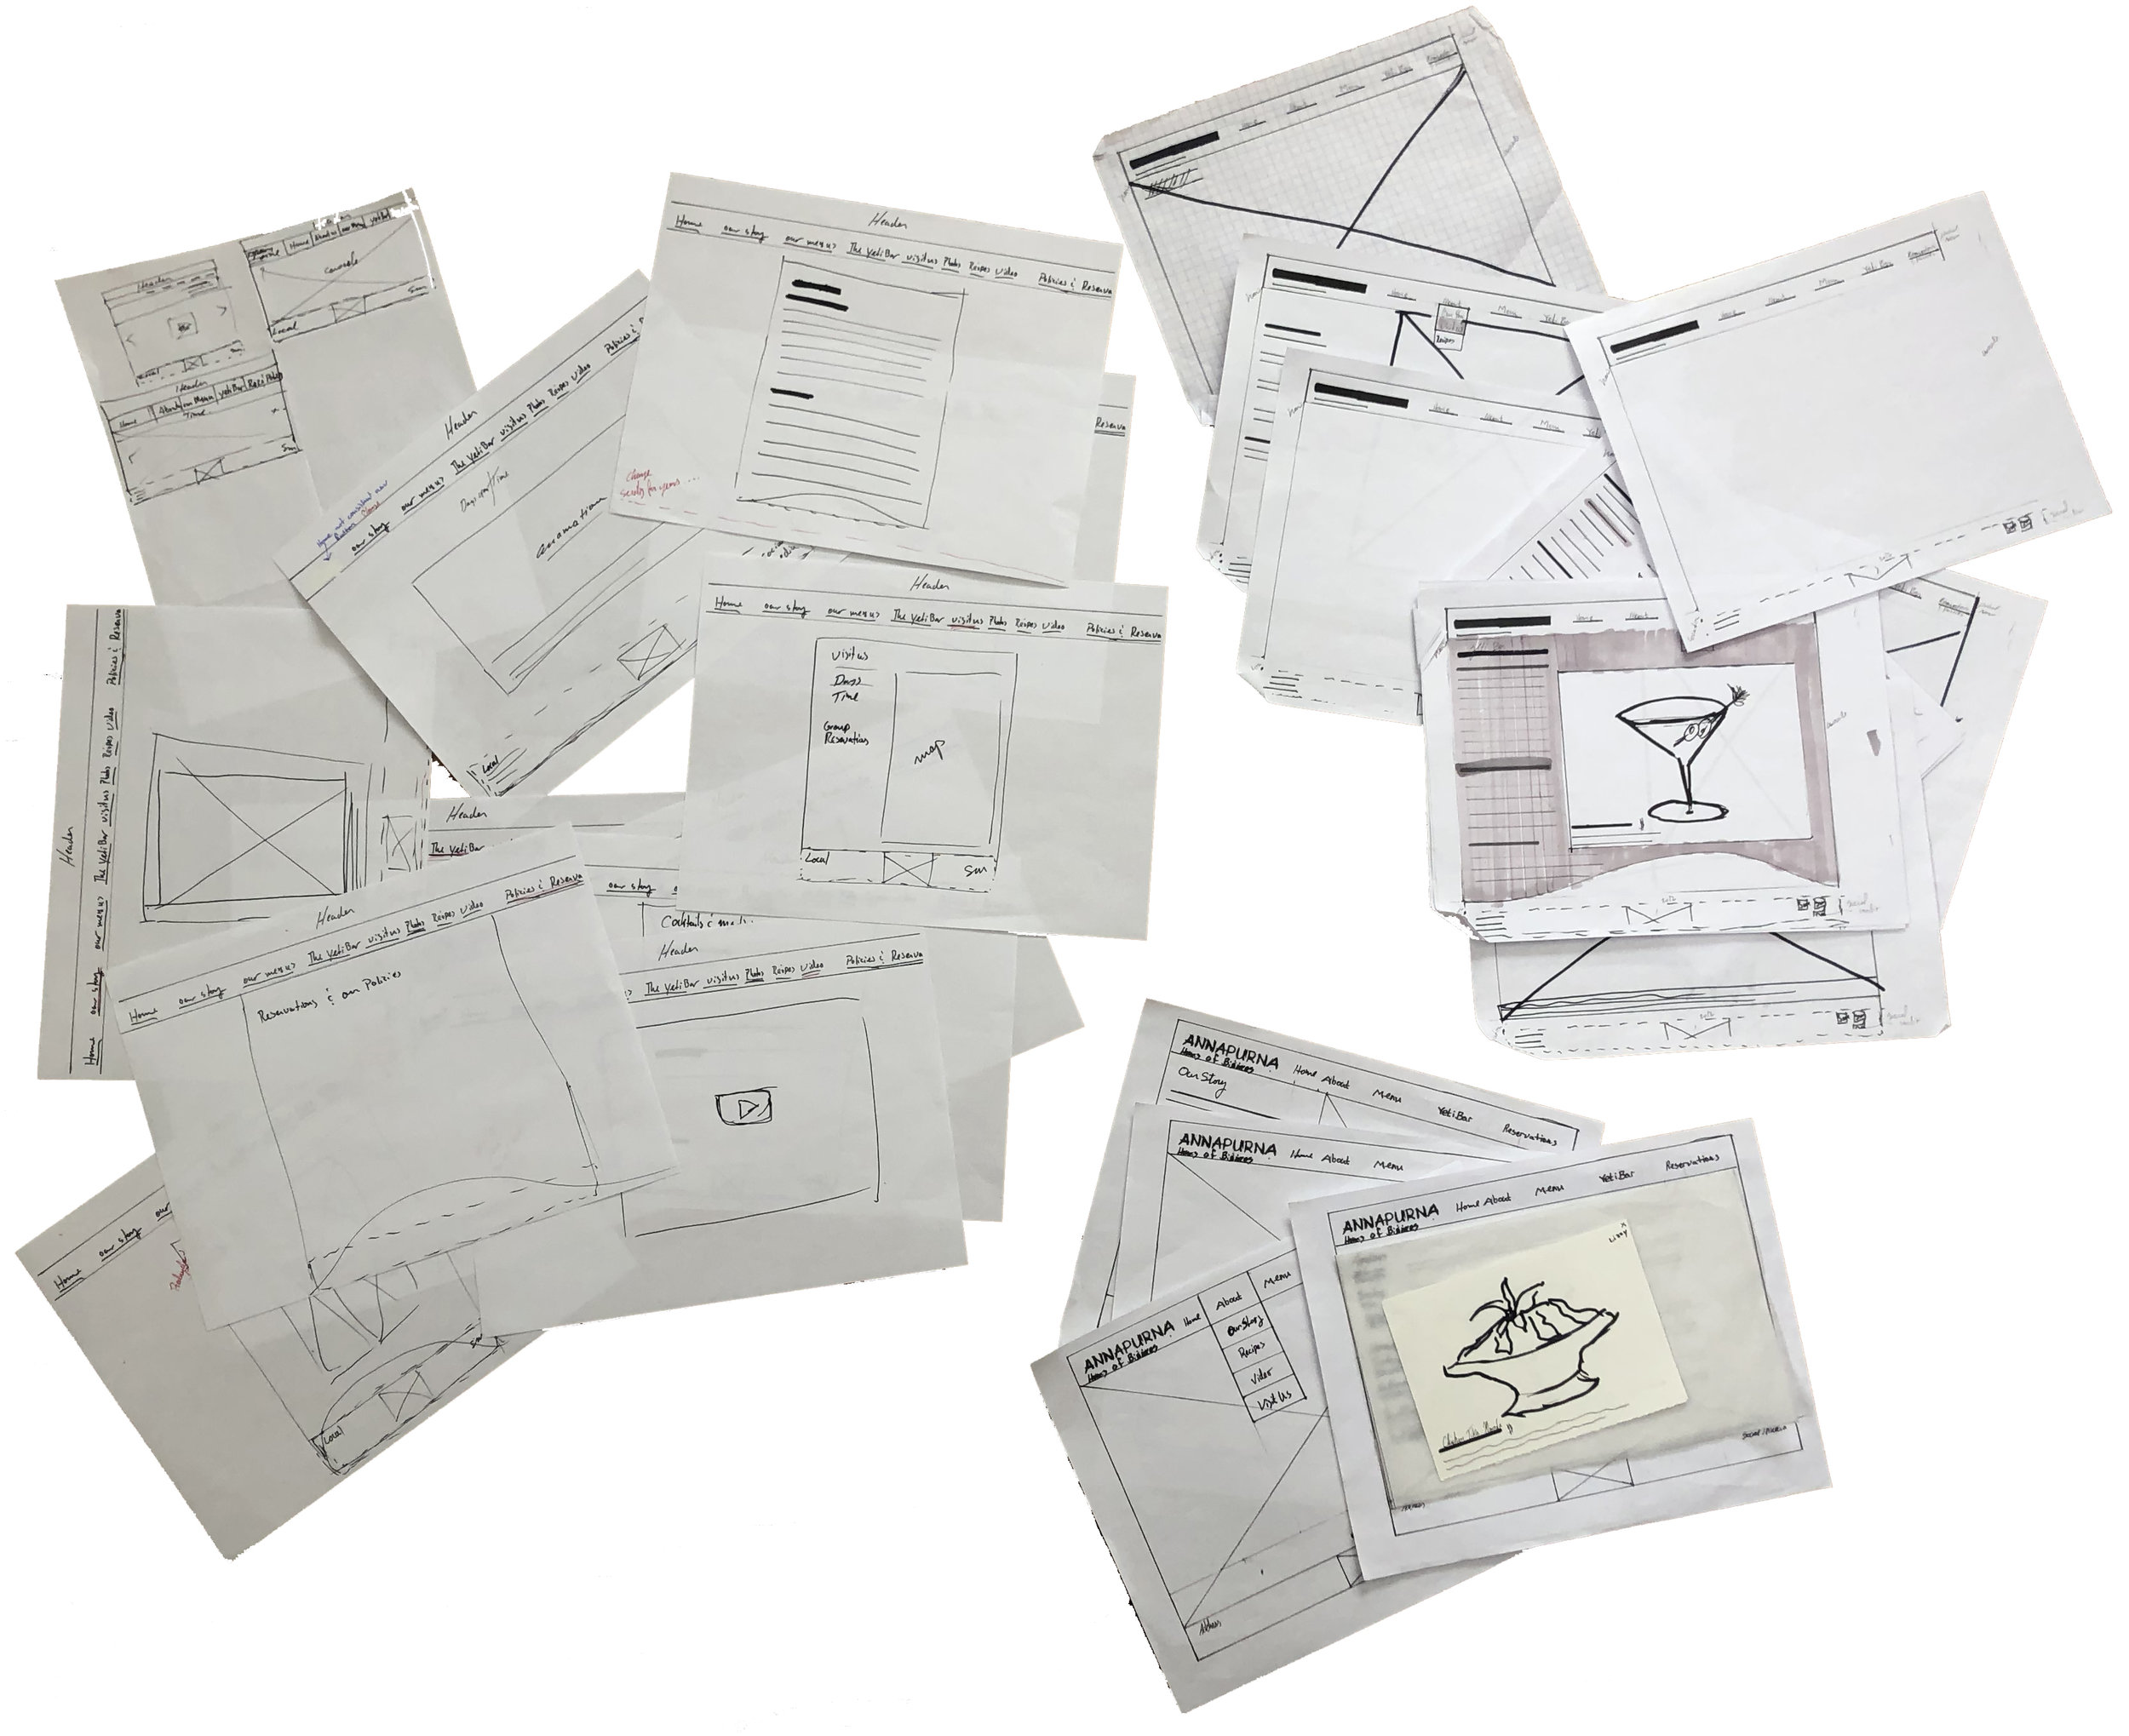 P2 sketching images.jpg